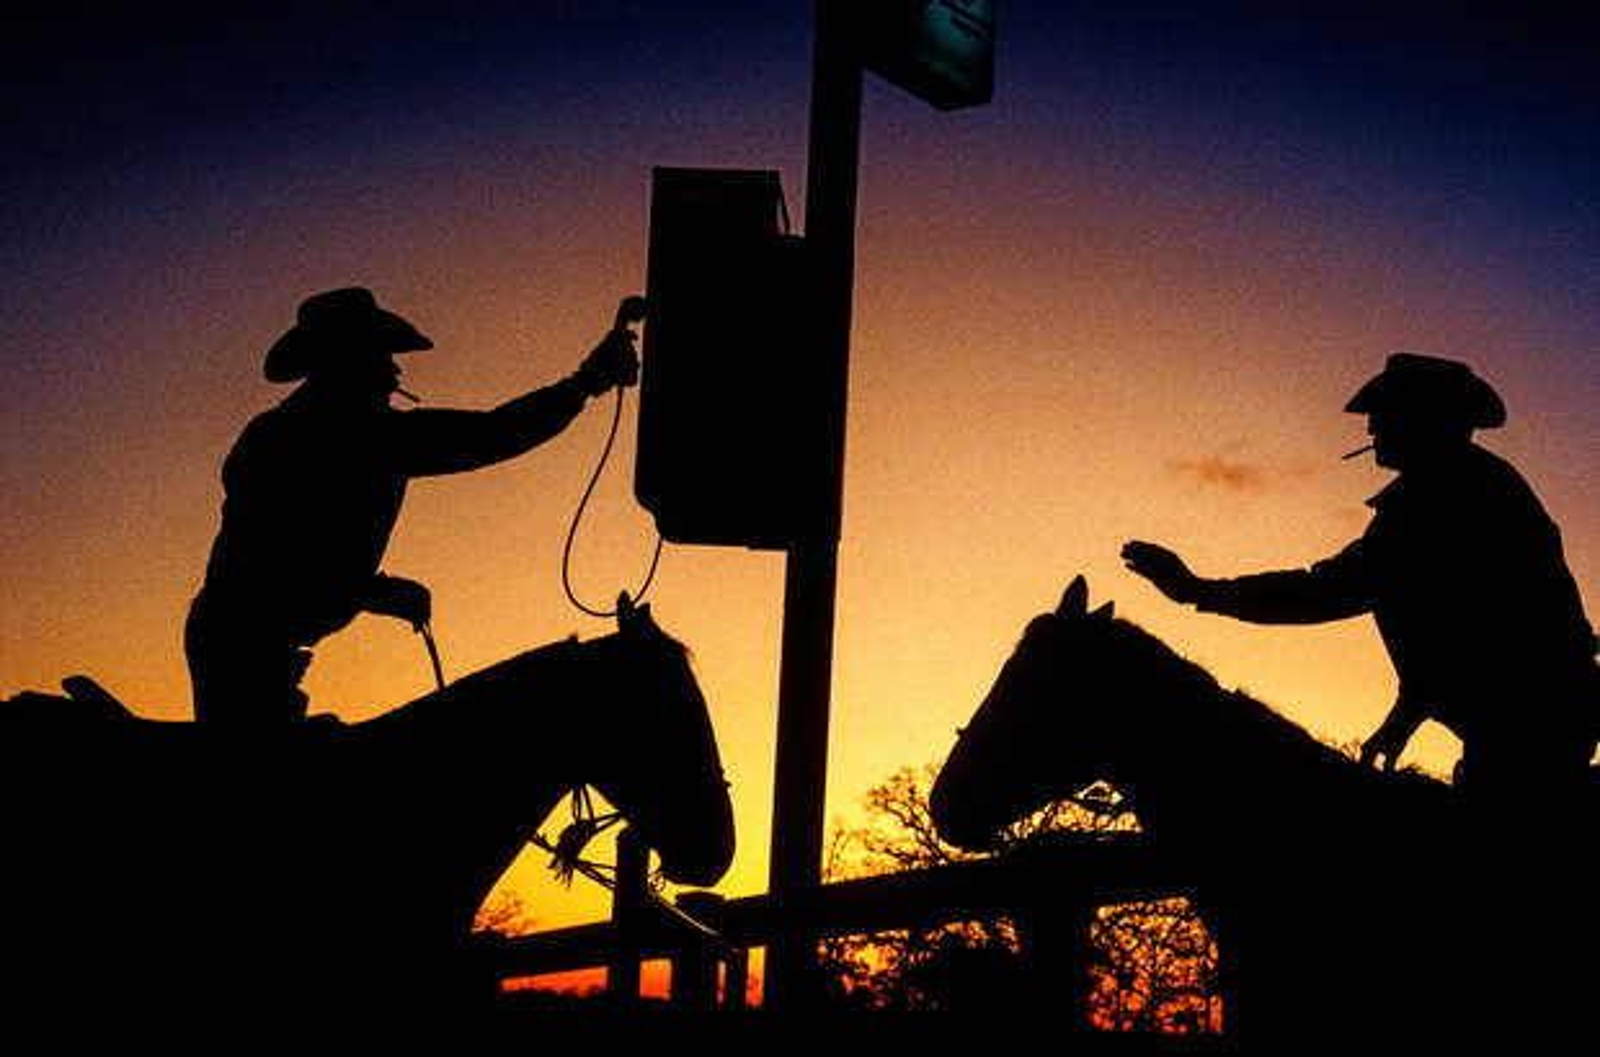 Cowboy Telefon, Texas - Dieter Blum